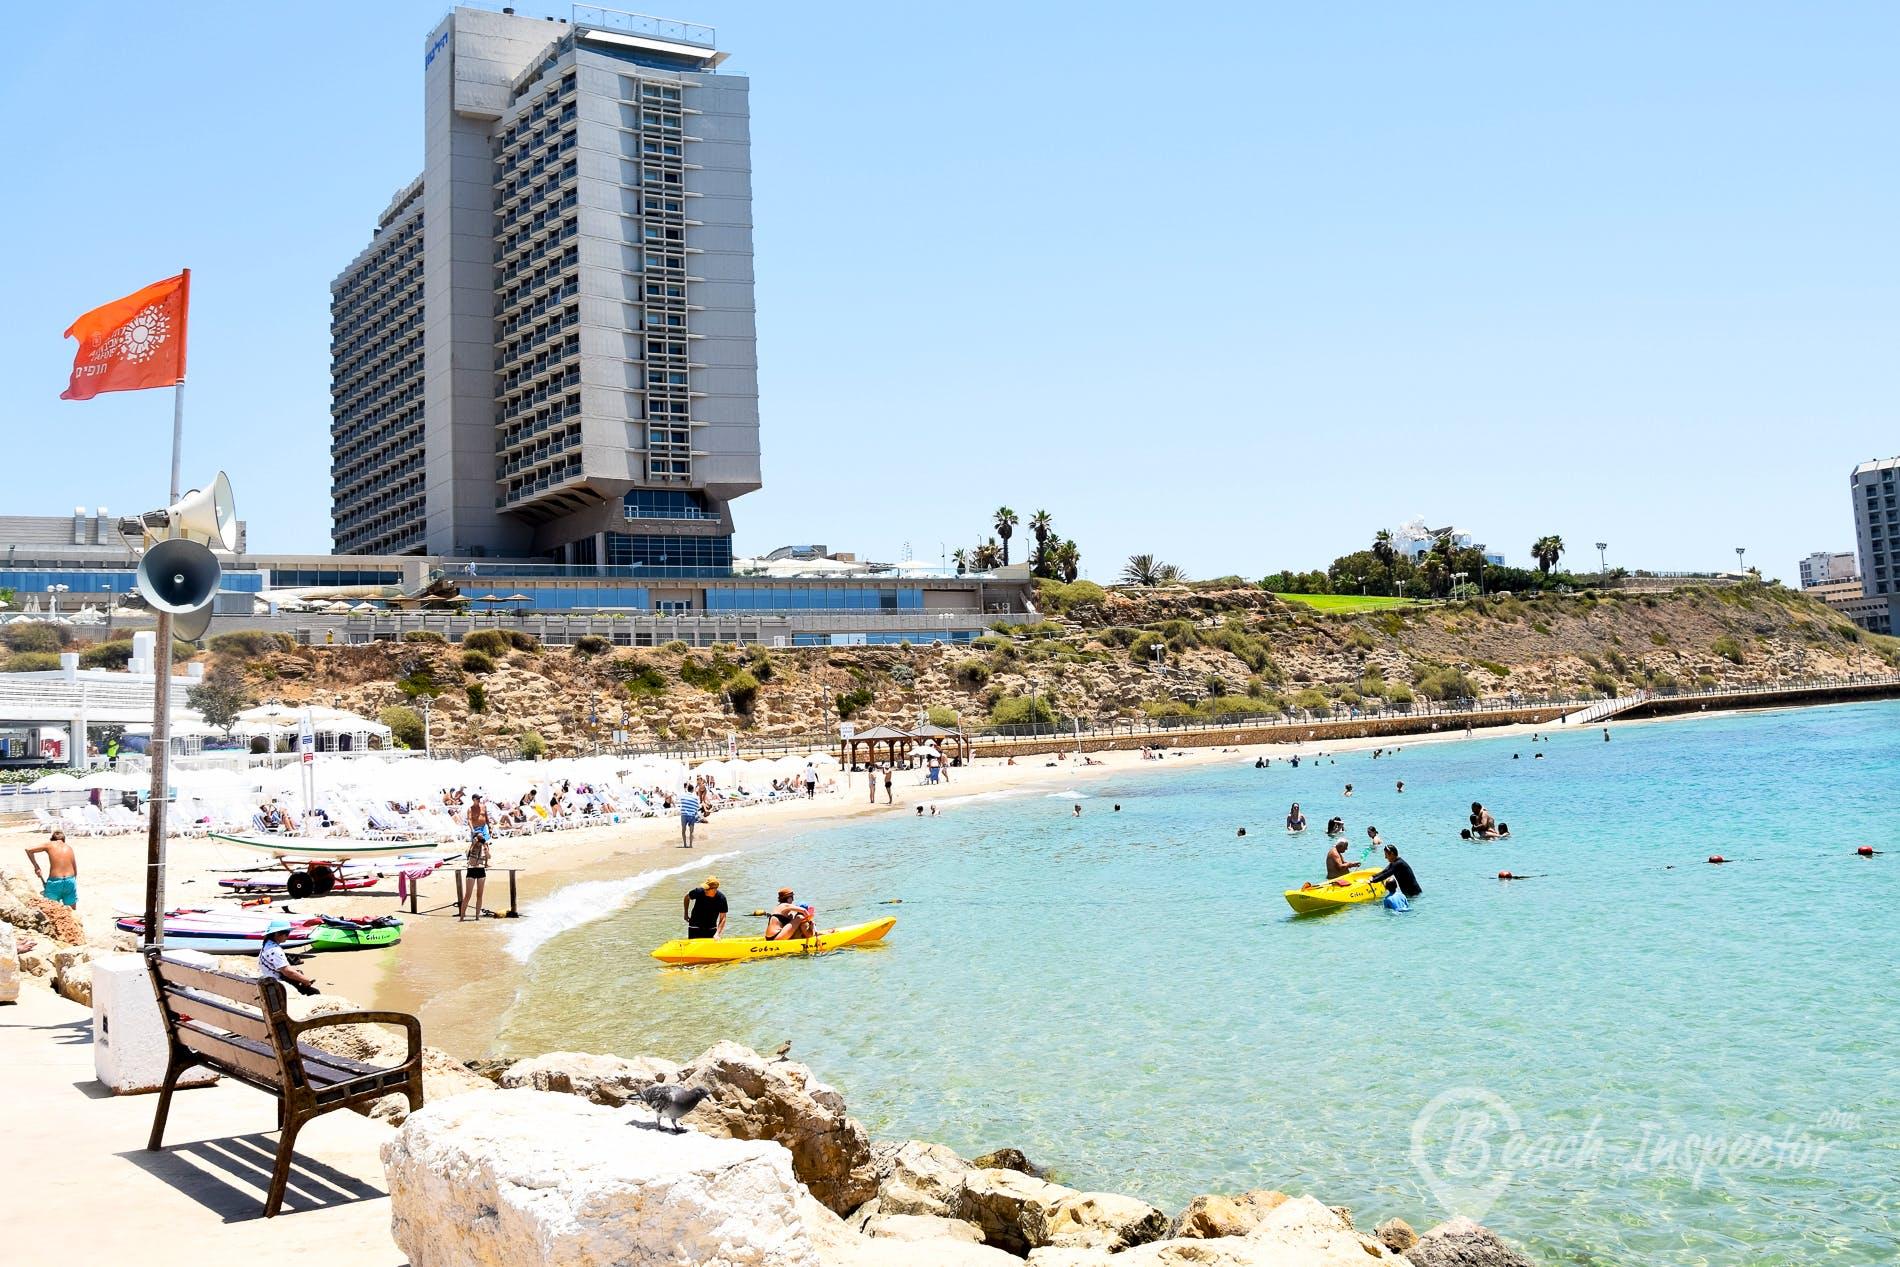 Playa Hilton Beach, Israel, Israel